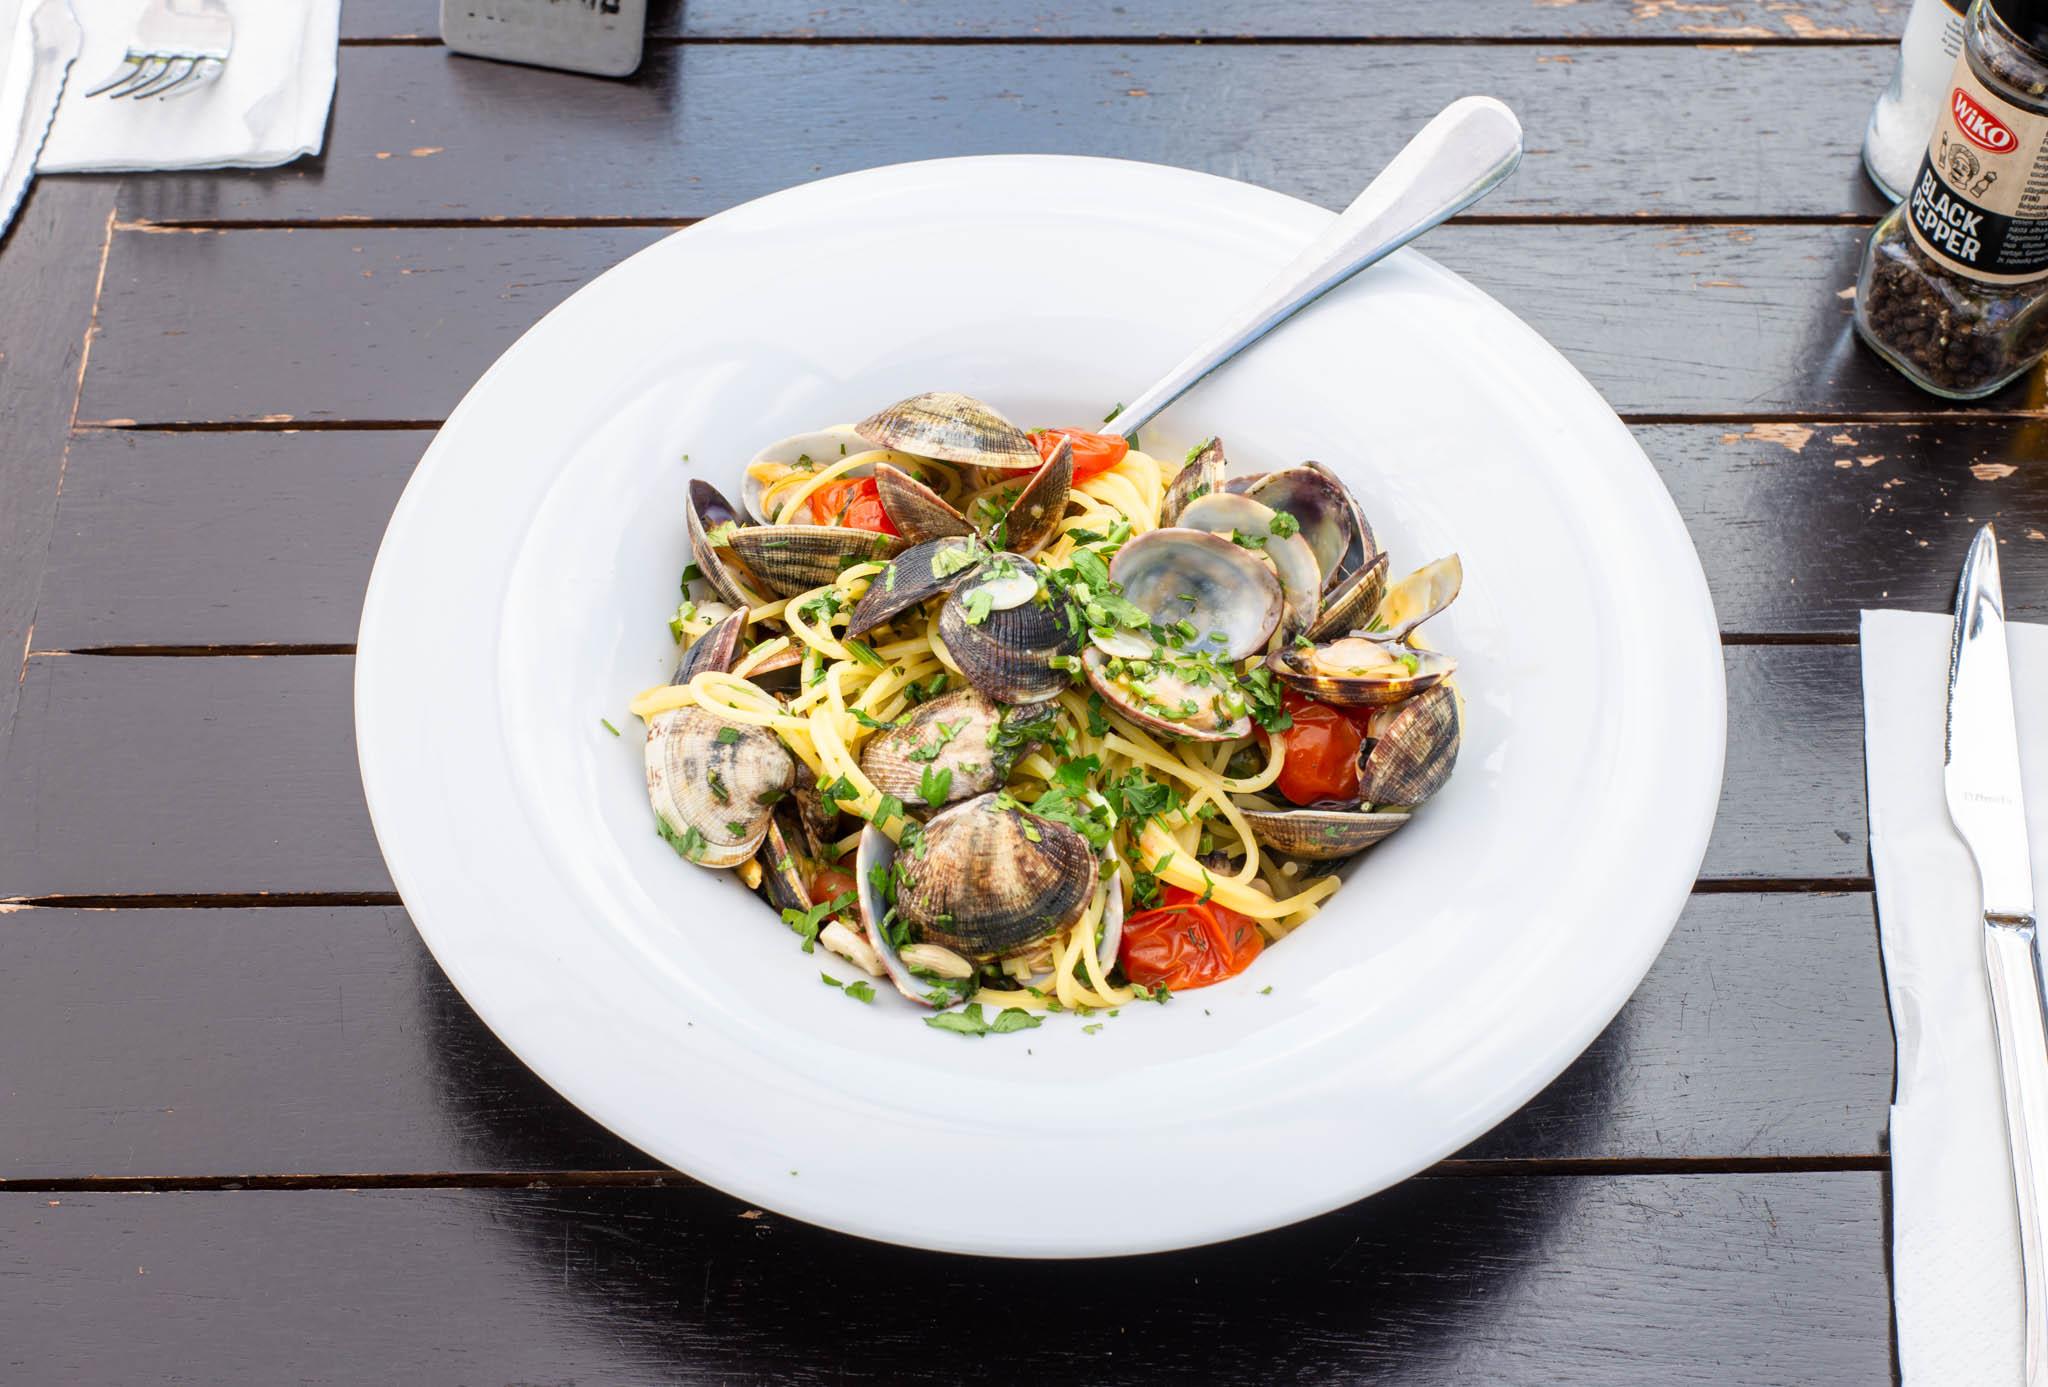 Italian dish on the table